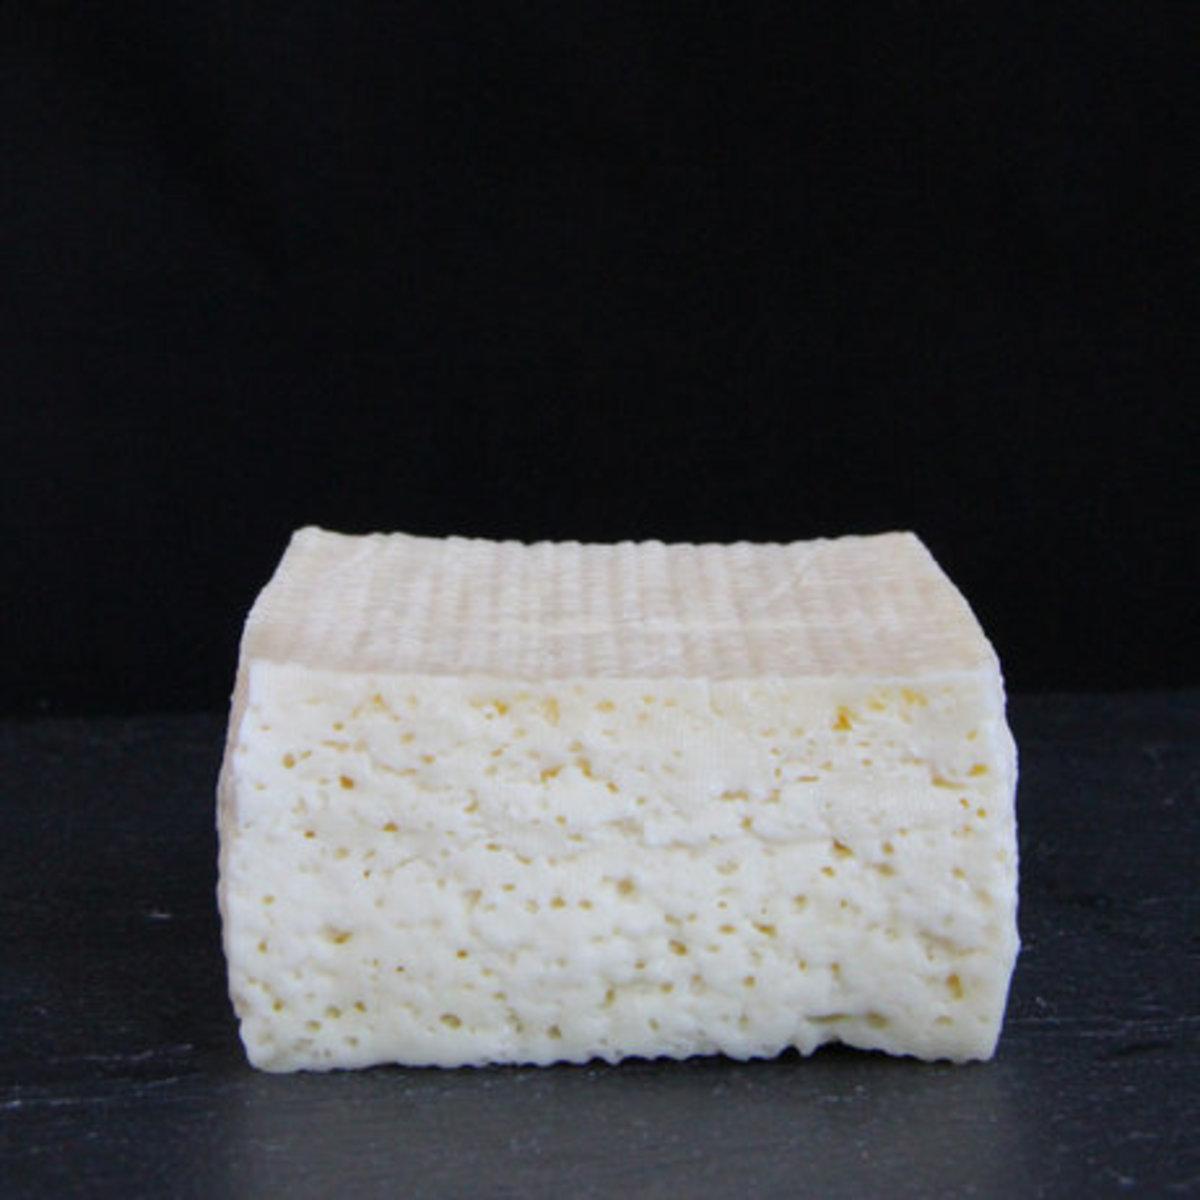 michael pollan cheese